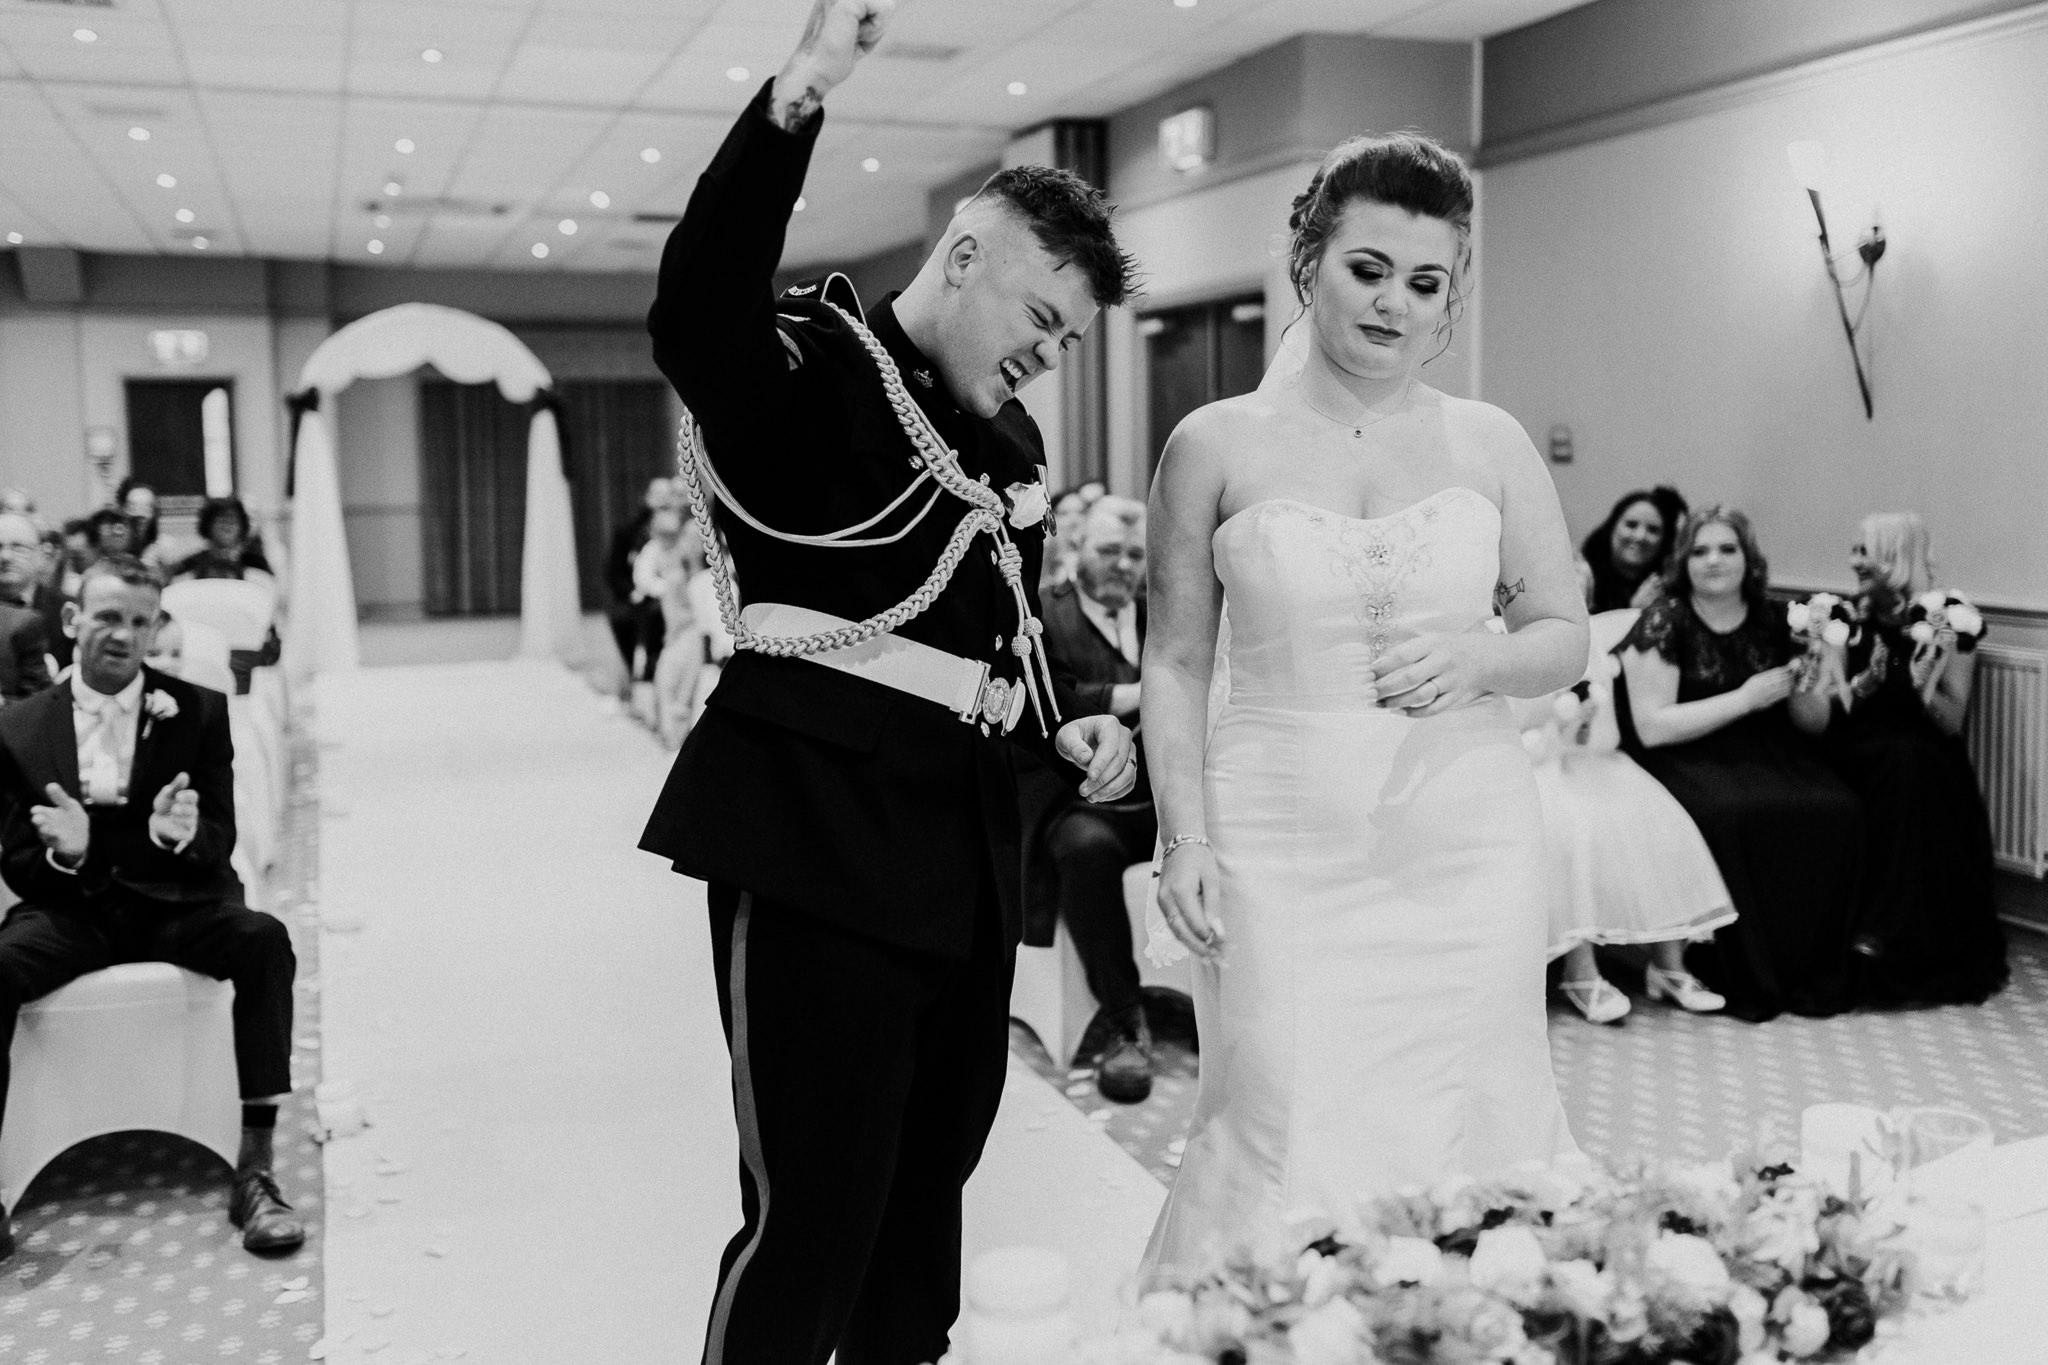 Mollingtonbanastre_wedding-ceremony.jpg